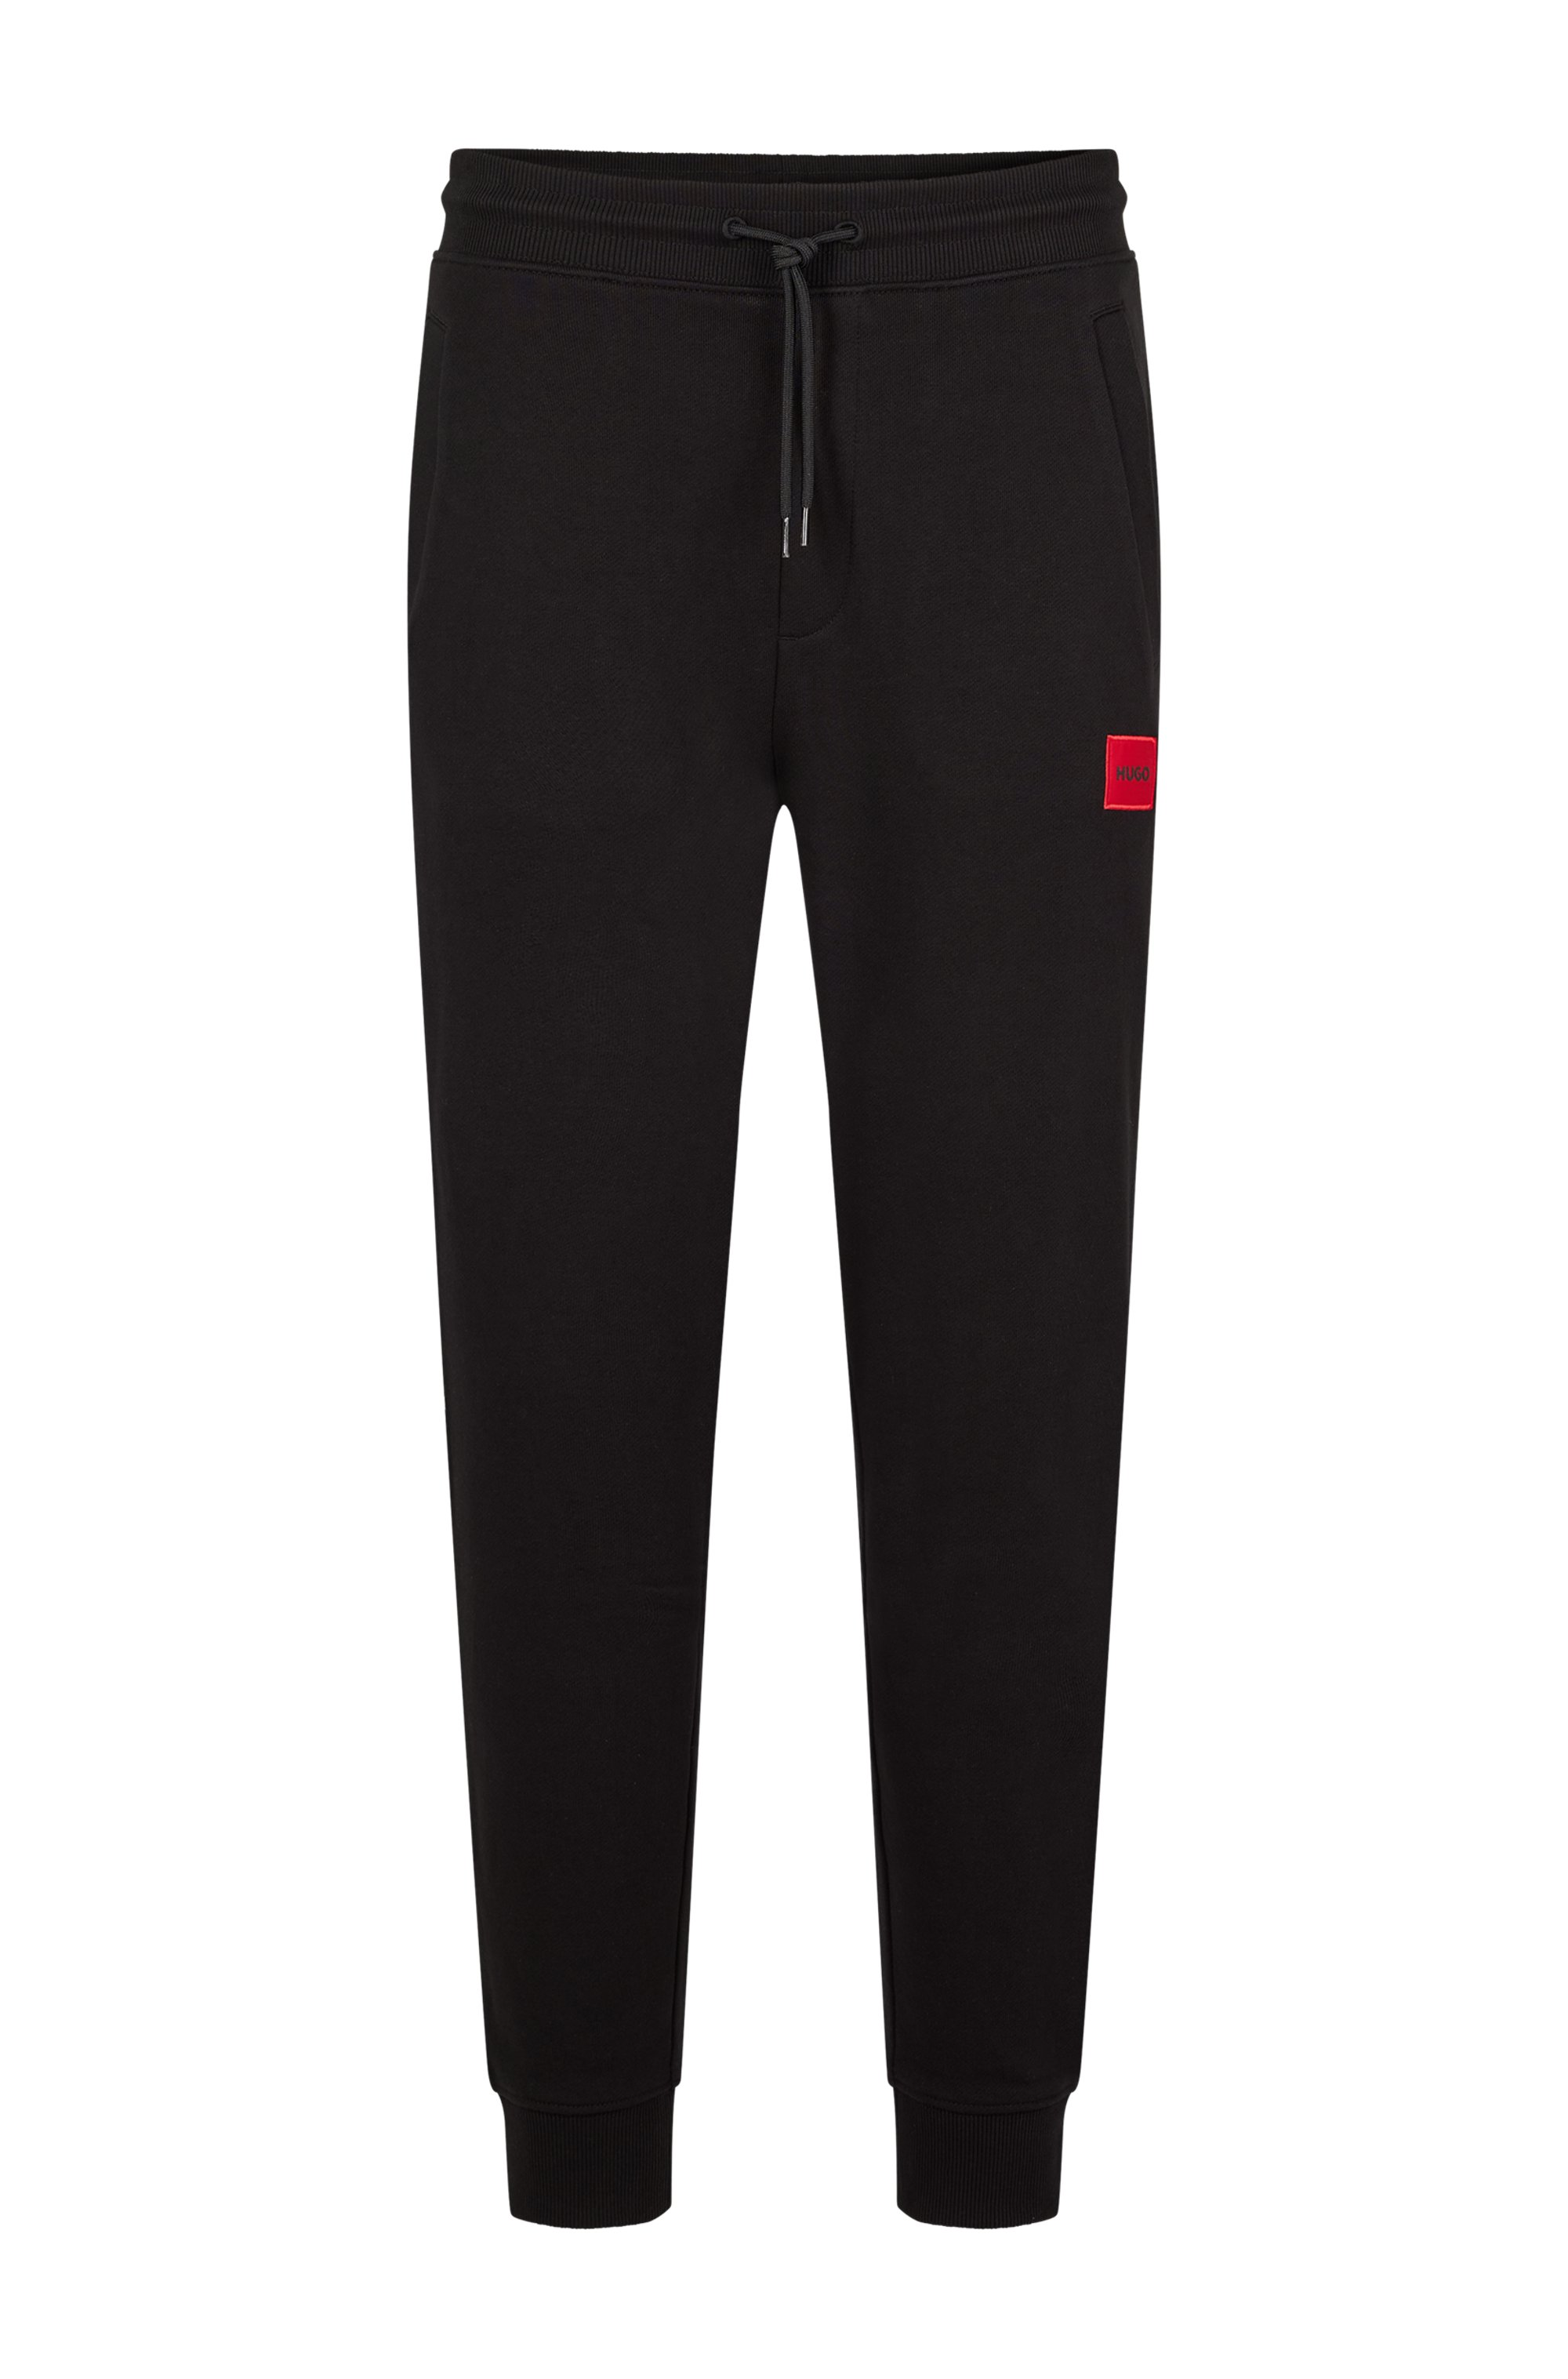 Jogginghose aus Baumwolle mit rotem Logo-Patch, Schwarz